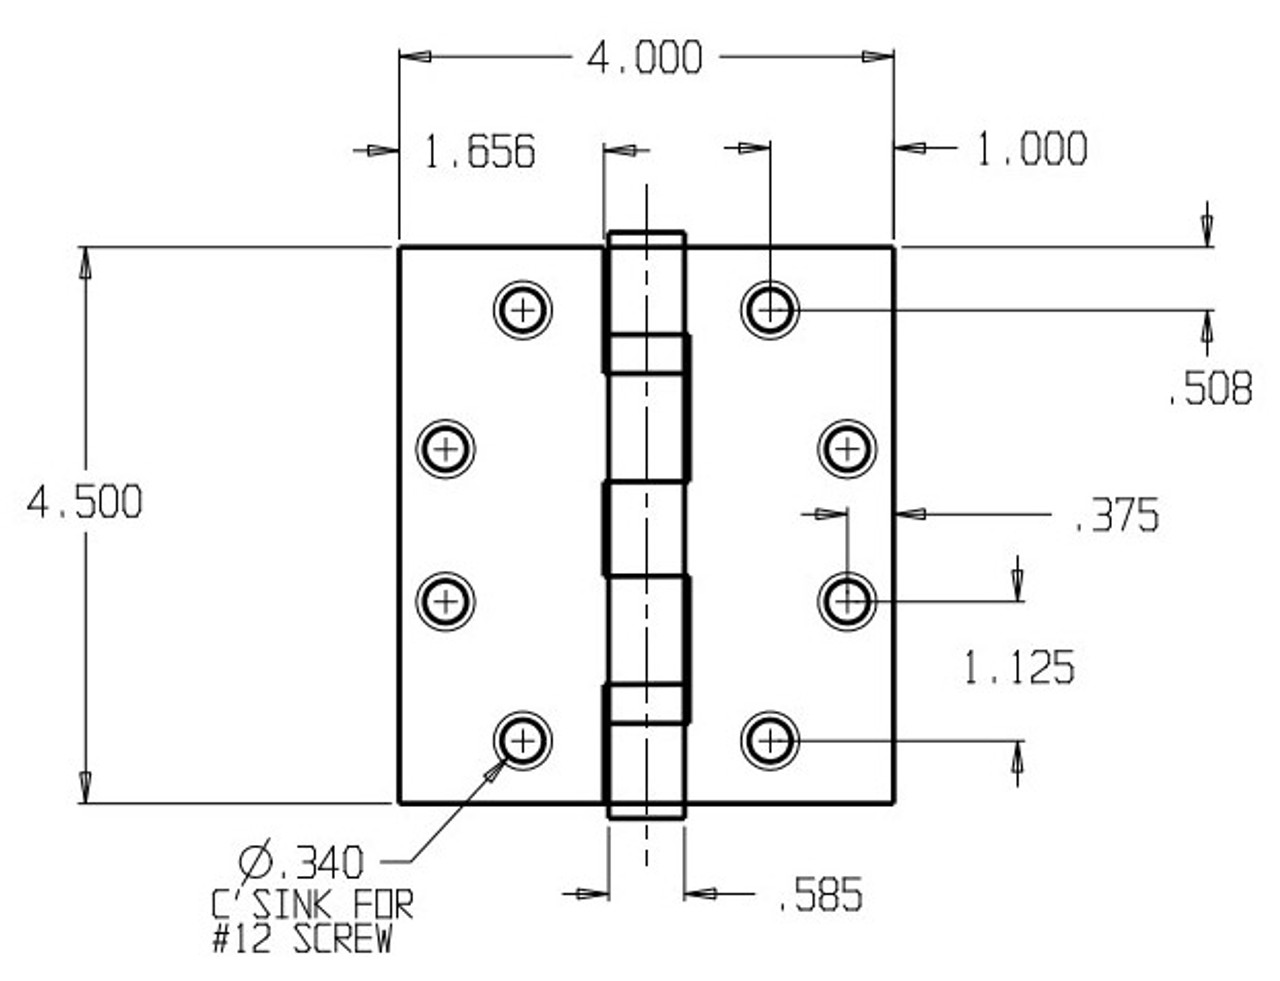 PB74540-652 Don Jo Full Mortise Plain Bearing Dimensional View